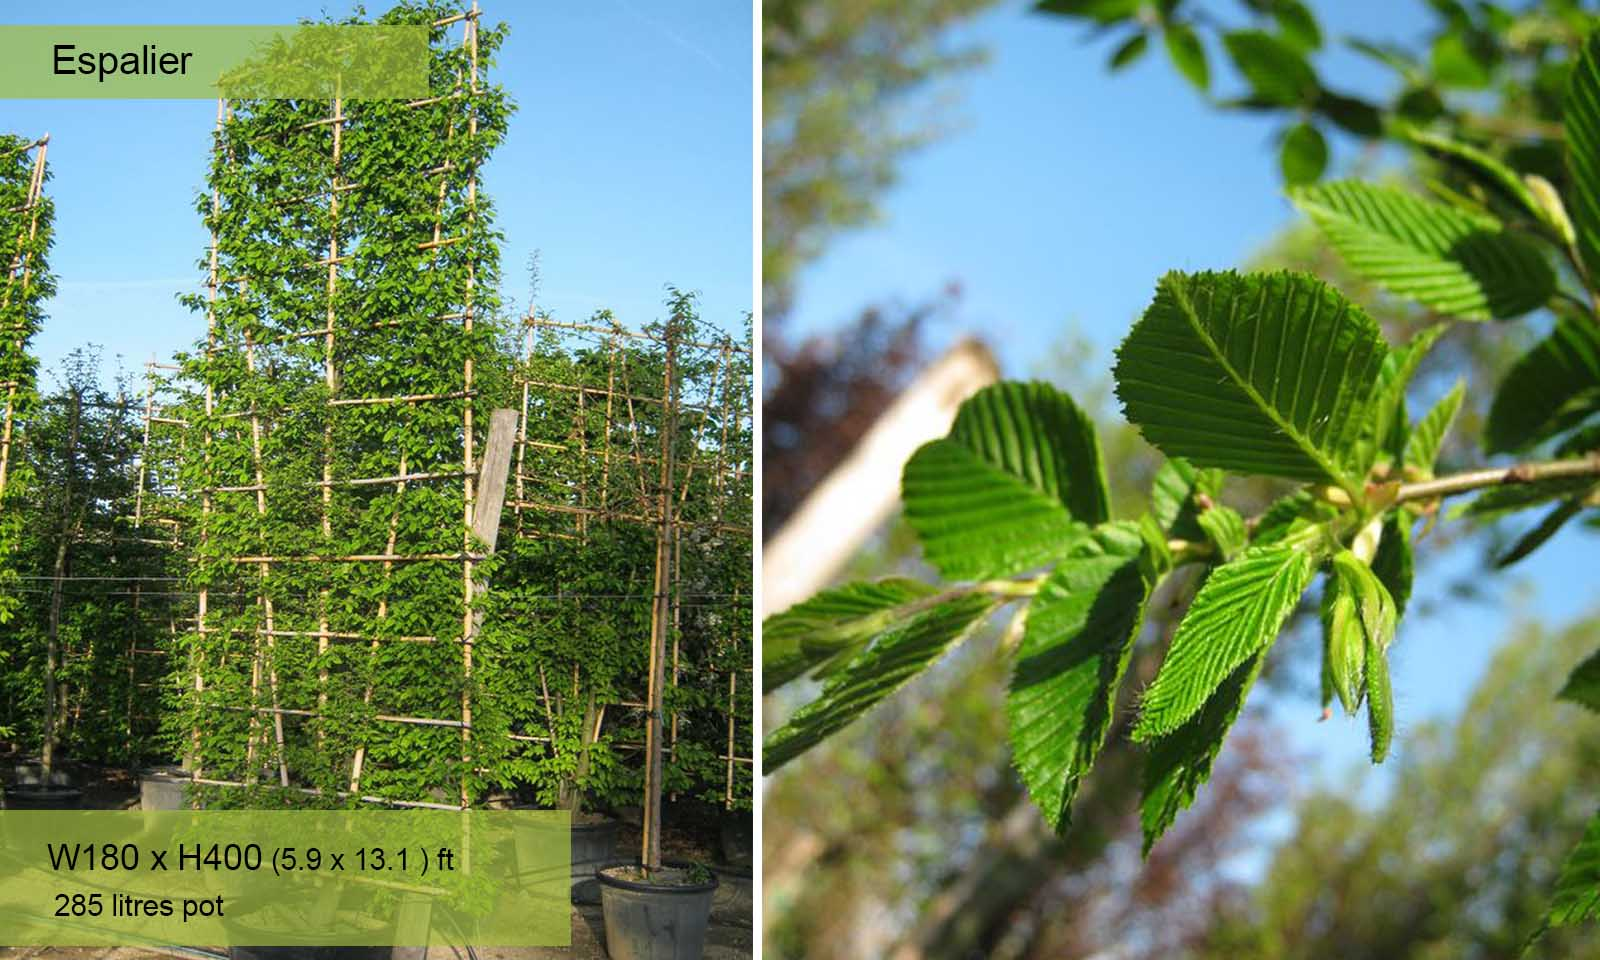 Carpinus Betulus - Espalier